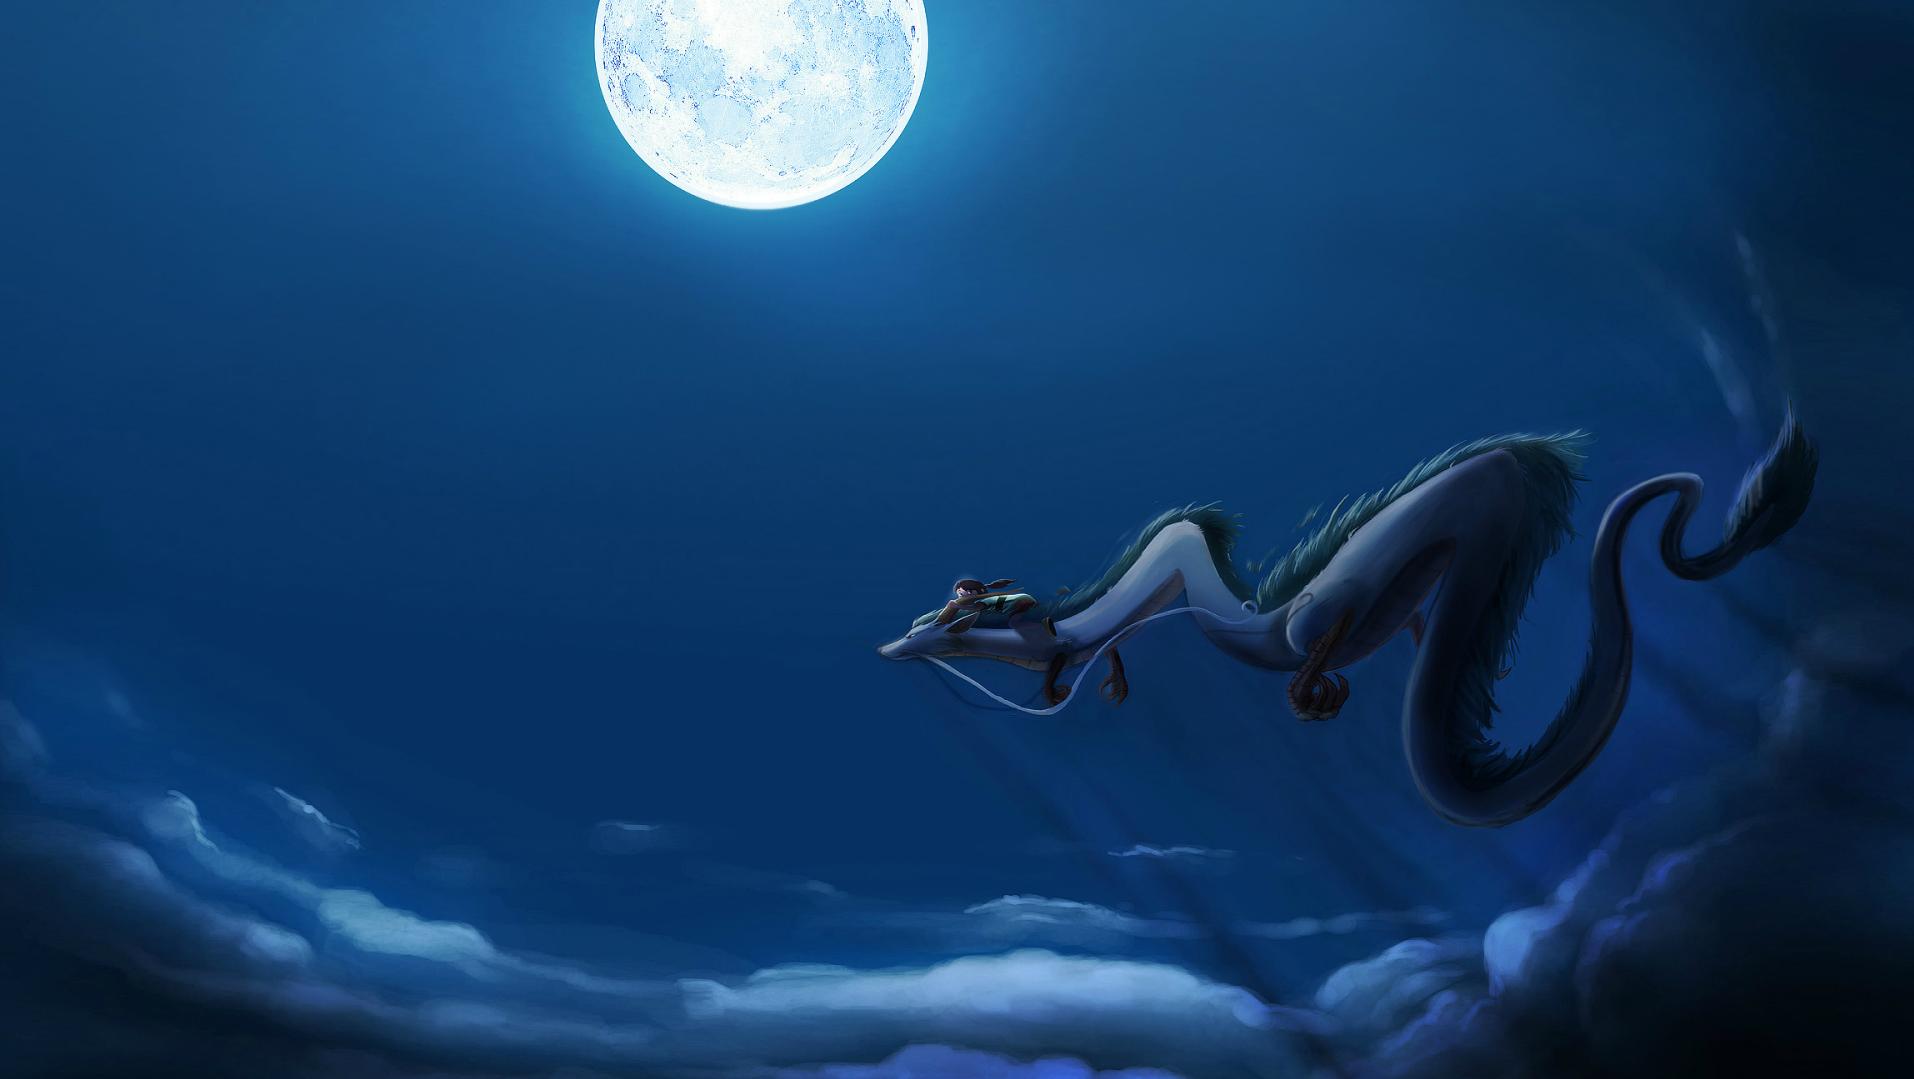 Studio Ghibli Backgrounds (With images) Studio ghibli